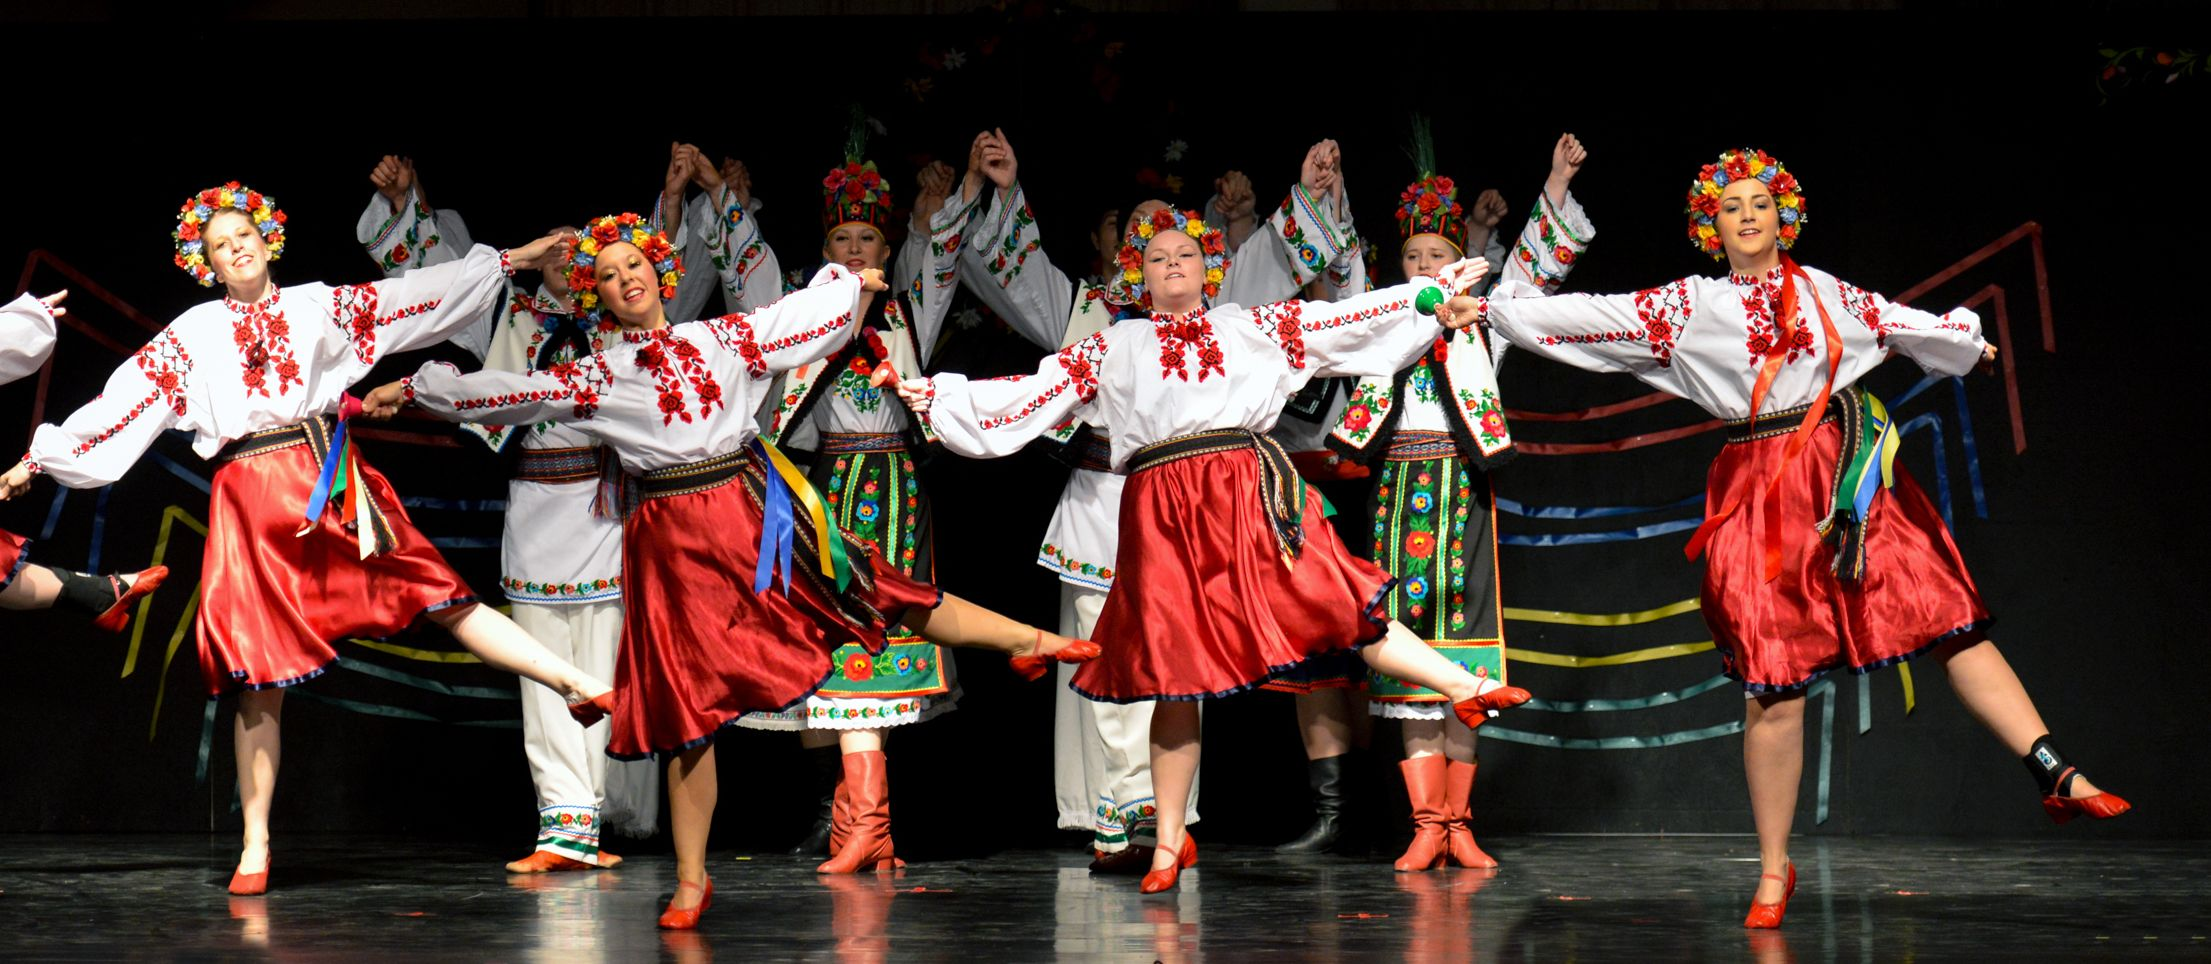 Spirit of Ukraine